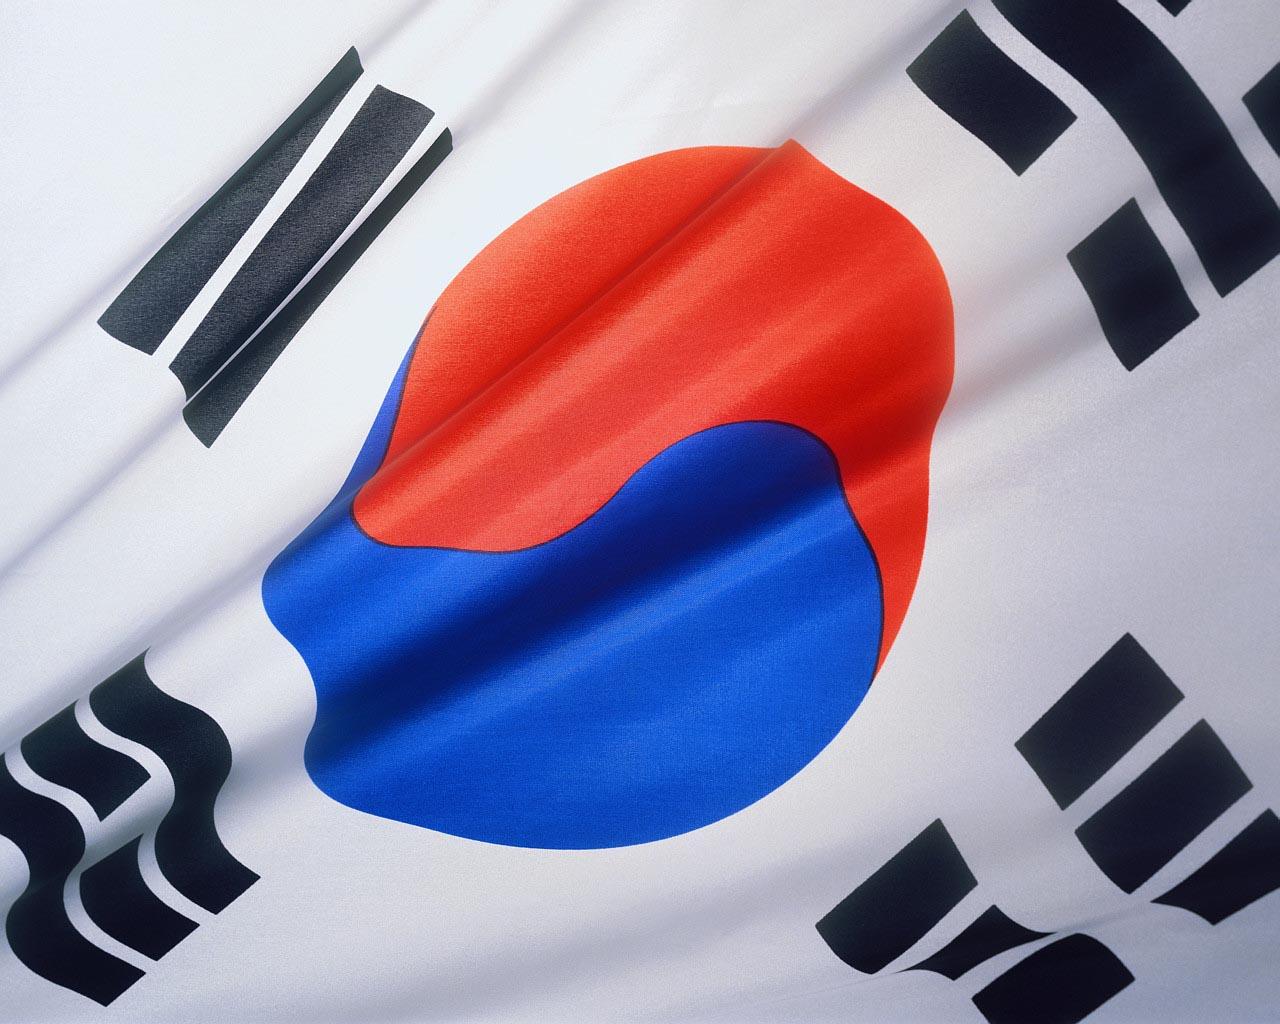 http://2.bp.blogspot.com/_Cc3gulUhlvs/TPNb7IQzbQI/AAAAAAAACxE/SYYu-hyjLUE/s1600/korean+flag.jpg